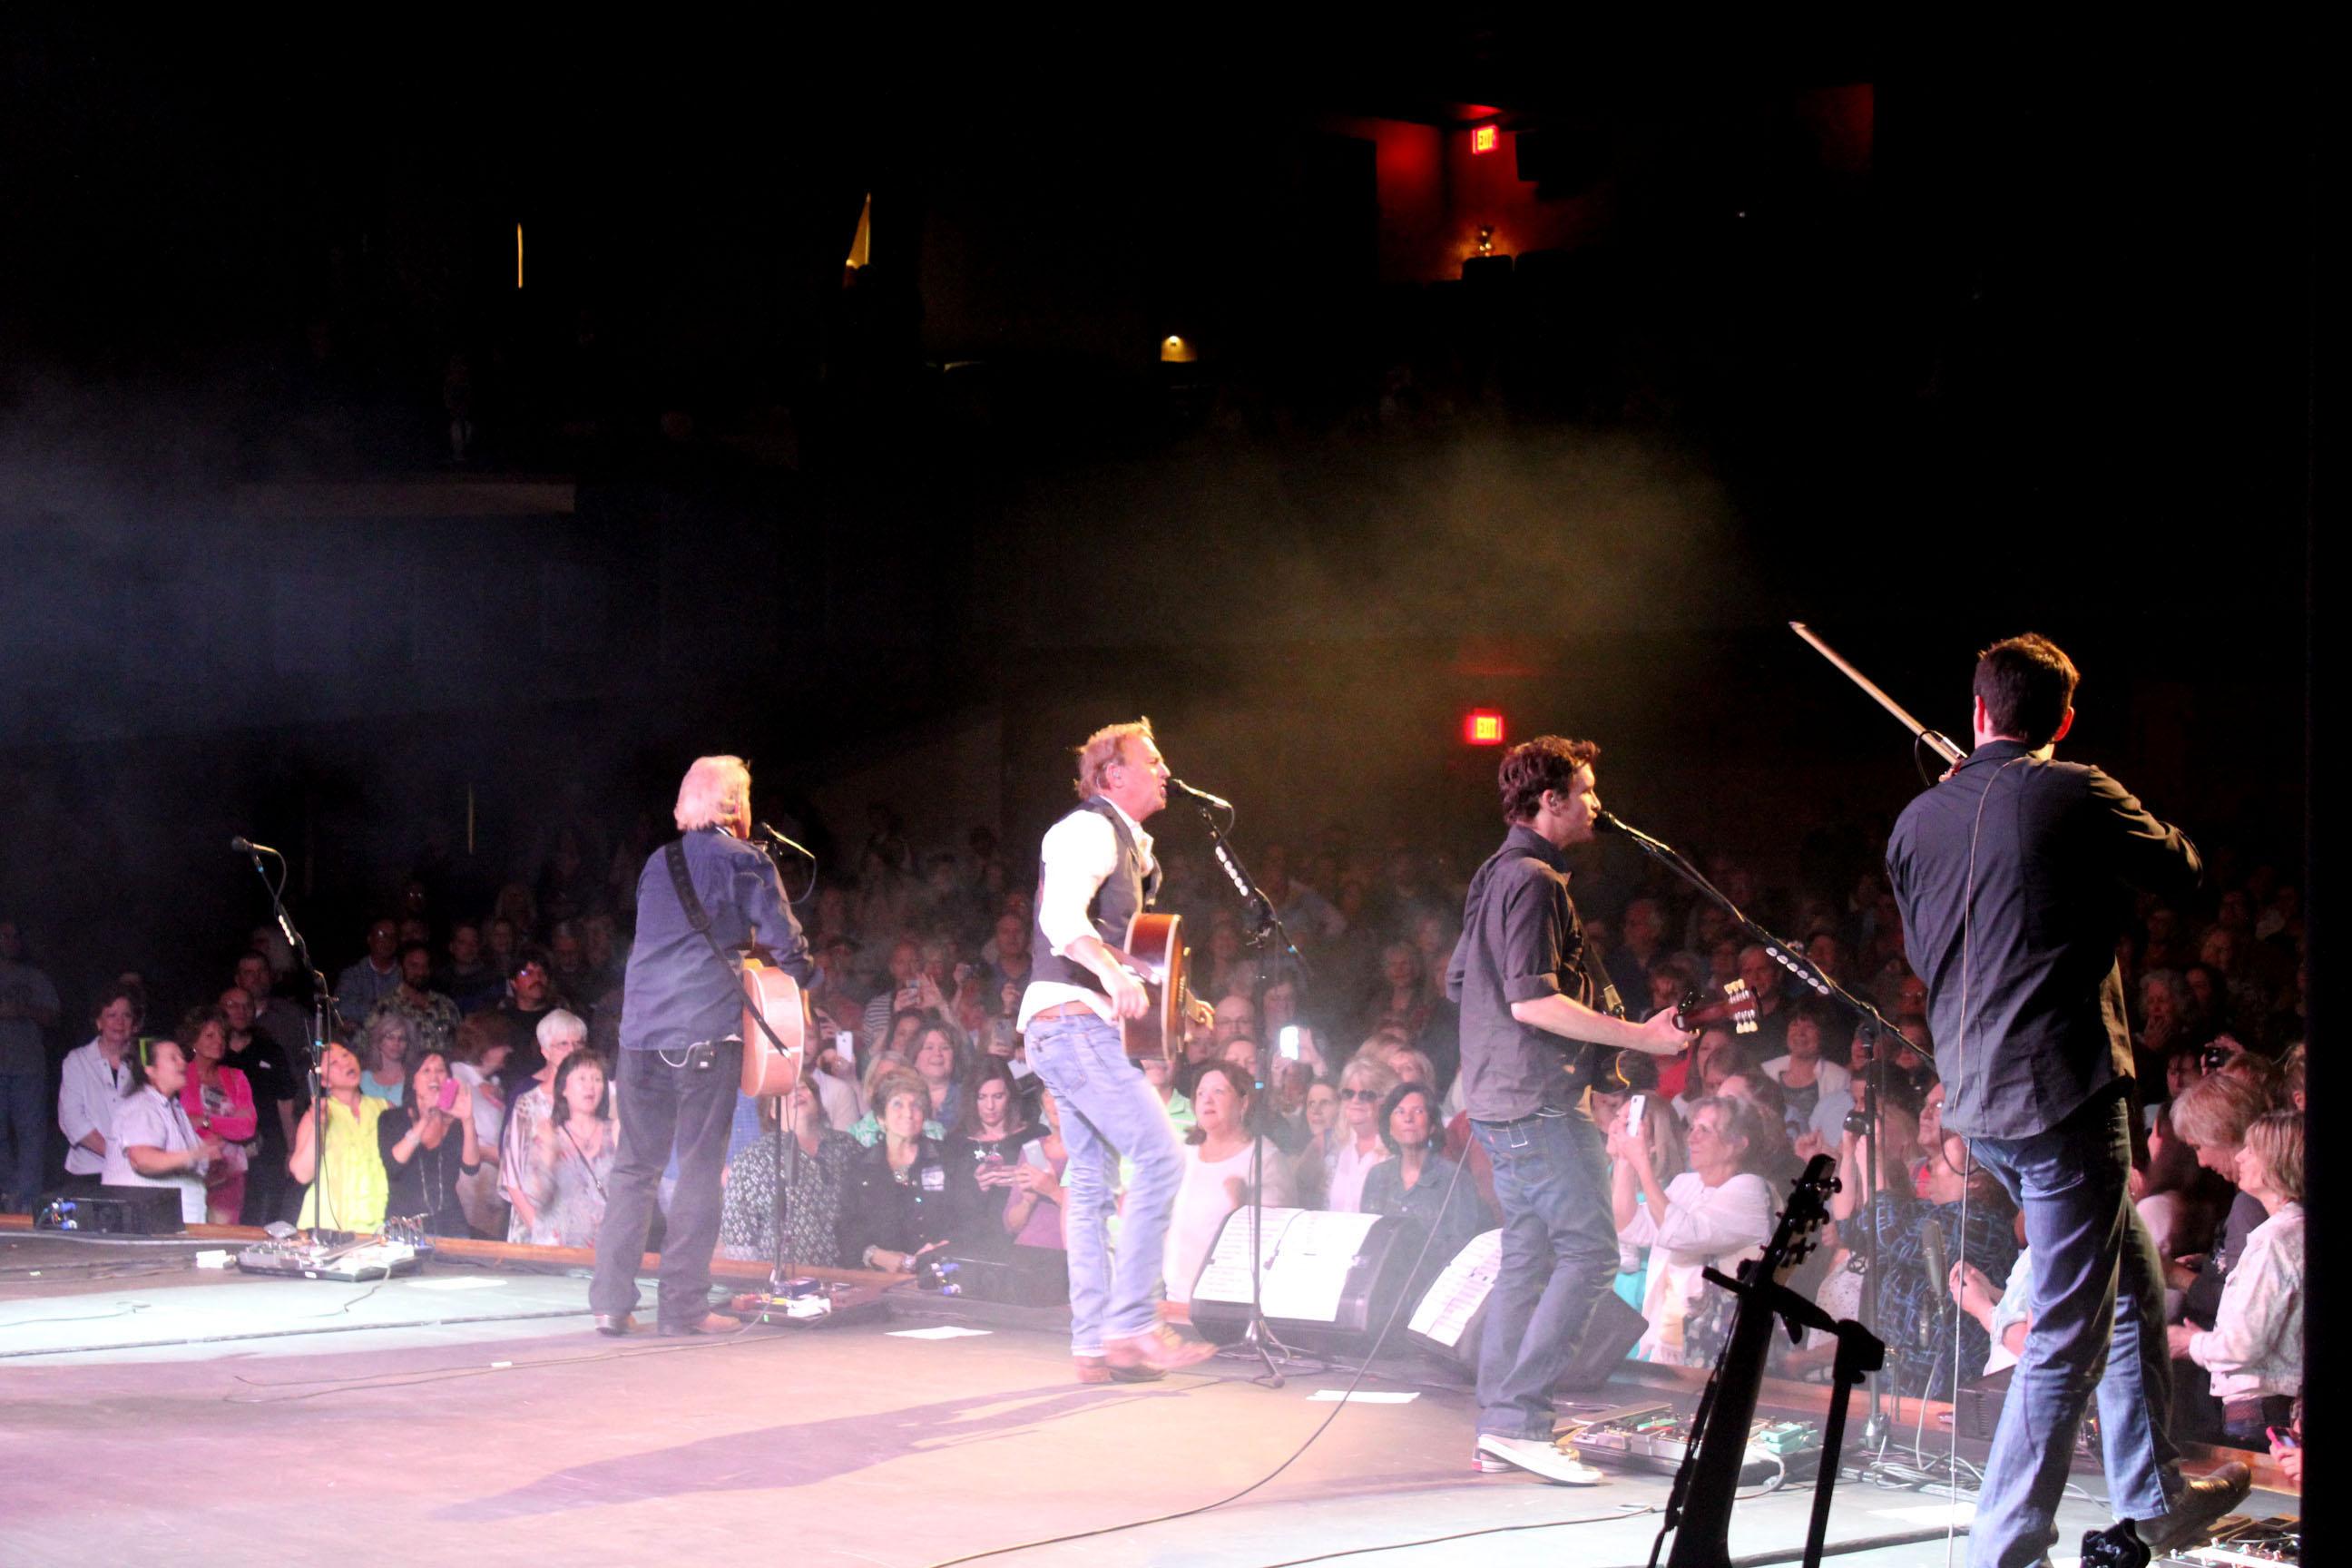 Kevin Costner & Modern West perform Friday in El Dorado.